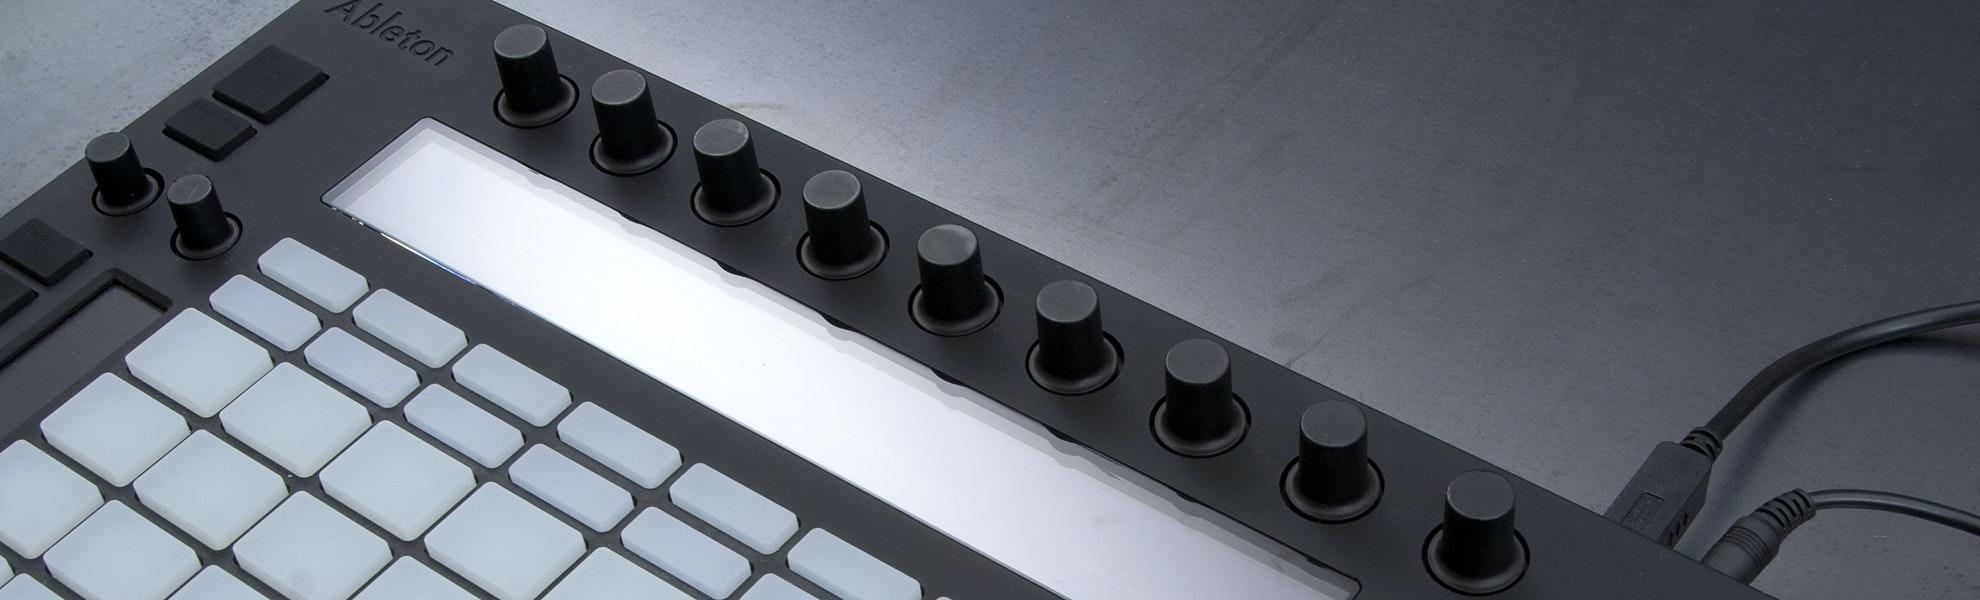 Ableton Push Controller